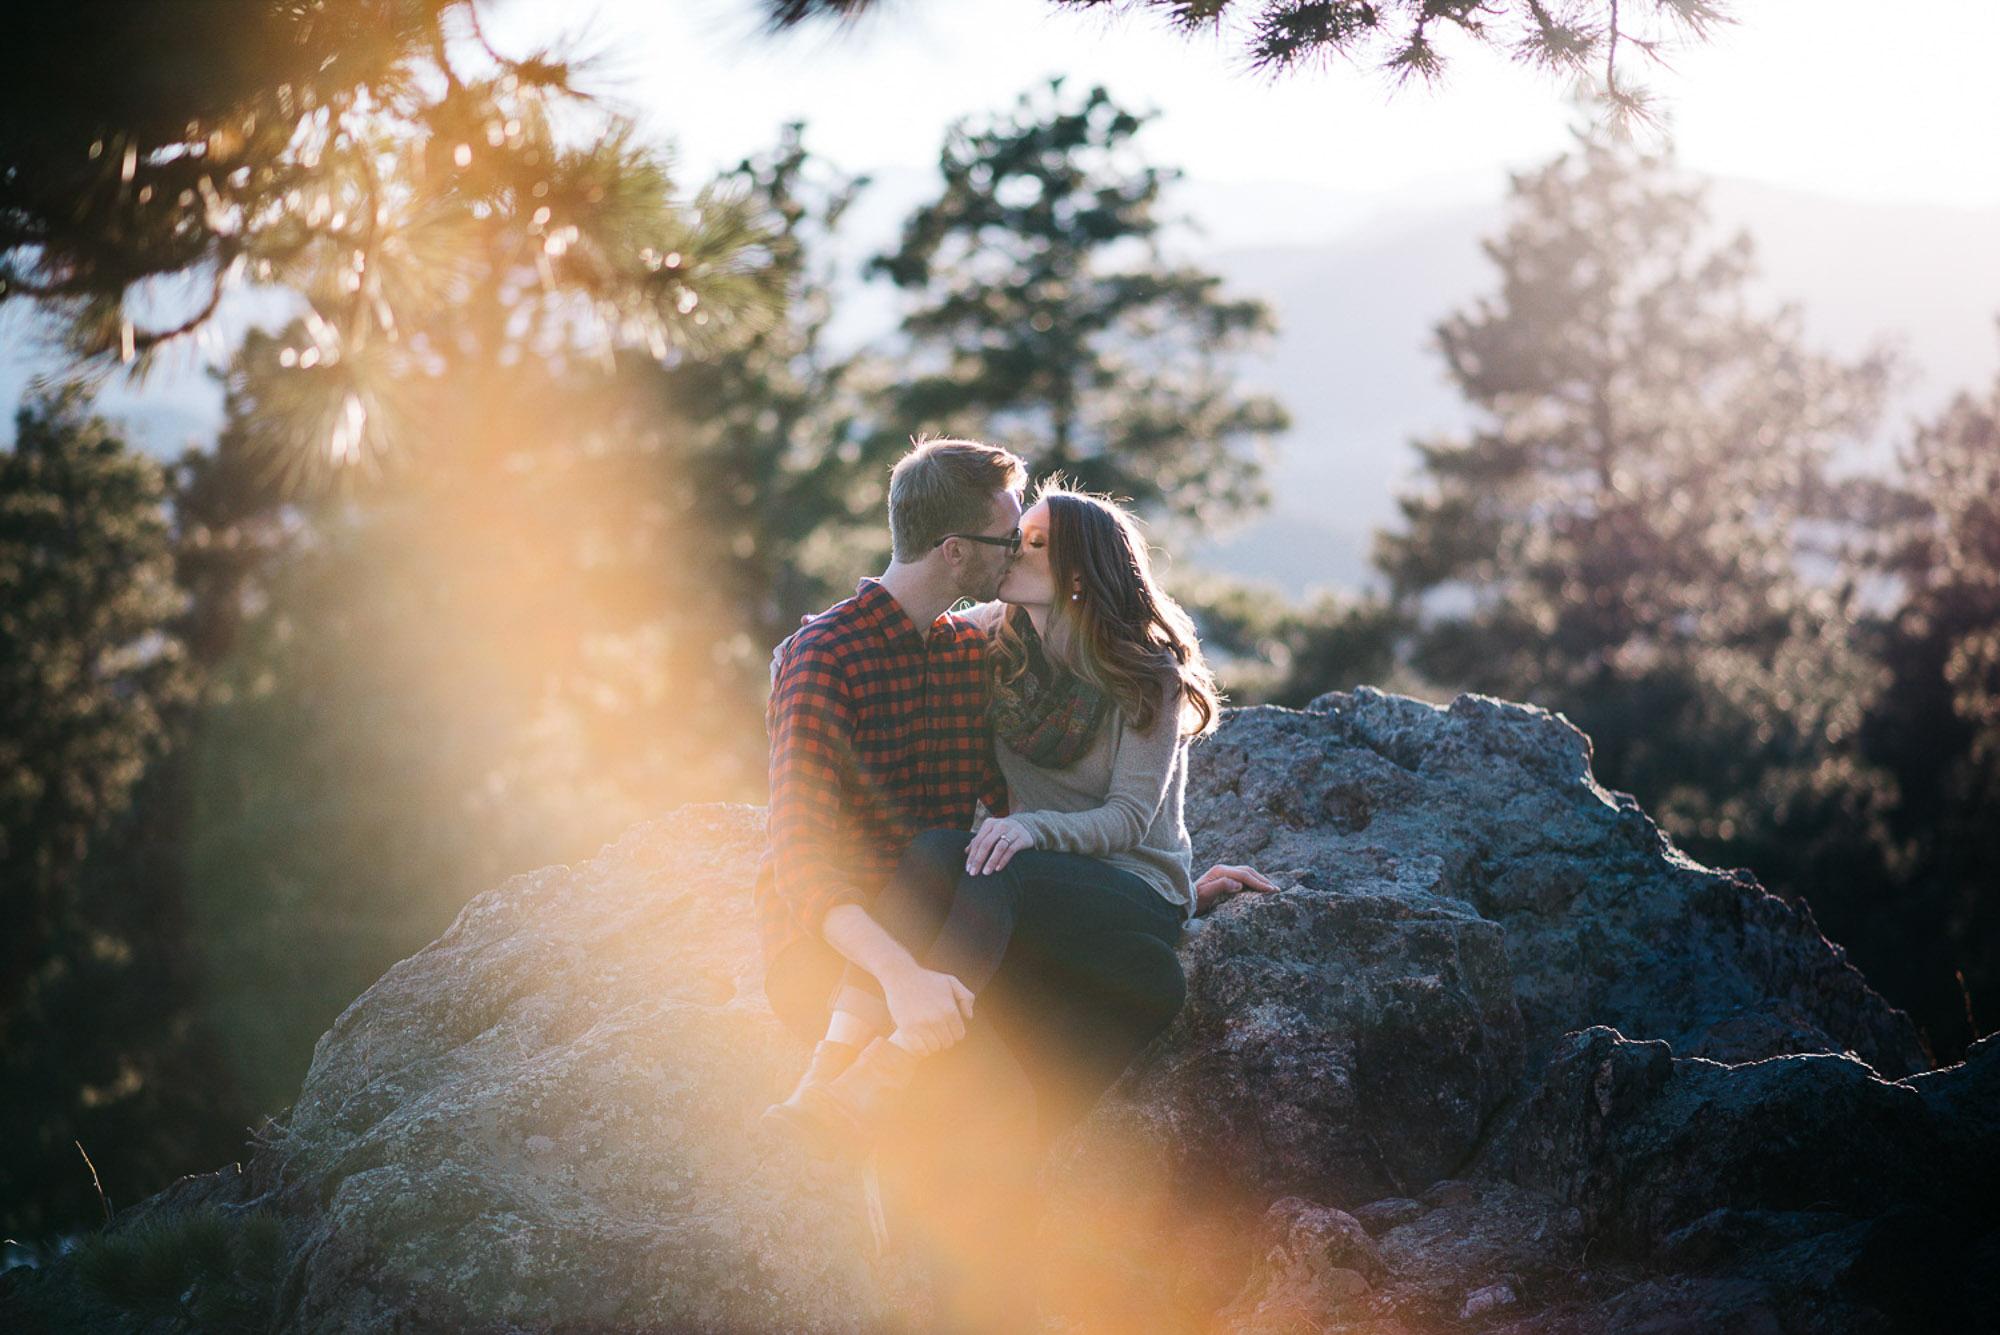 43-67couple-anniversary-engagement-photographer-colorado-mountain-wedding-photographer-carolyn&eric_engagement440.jpg